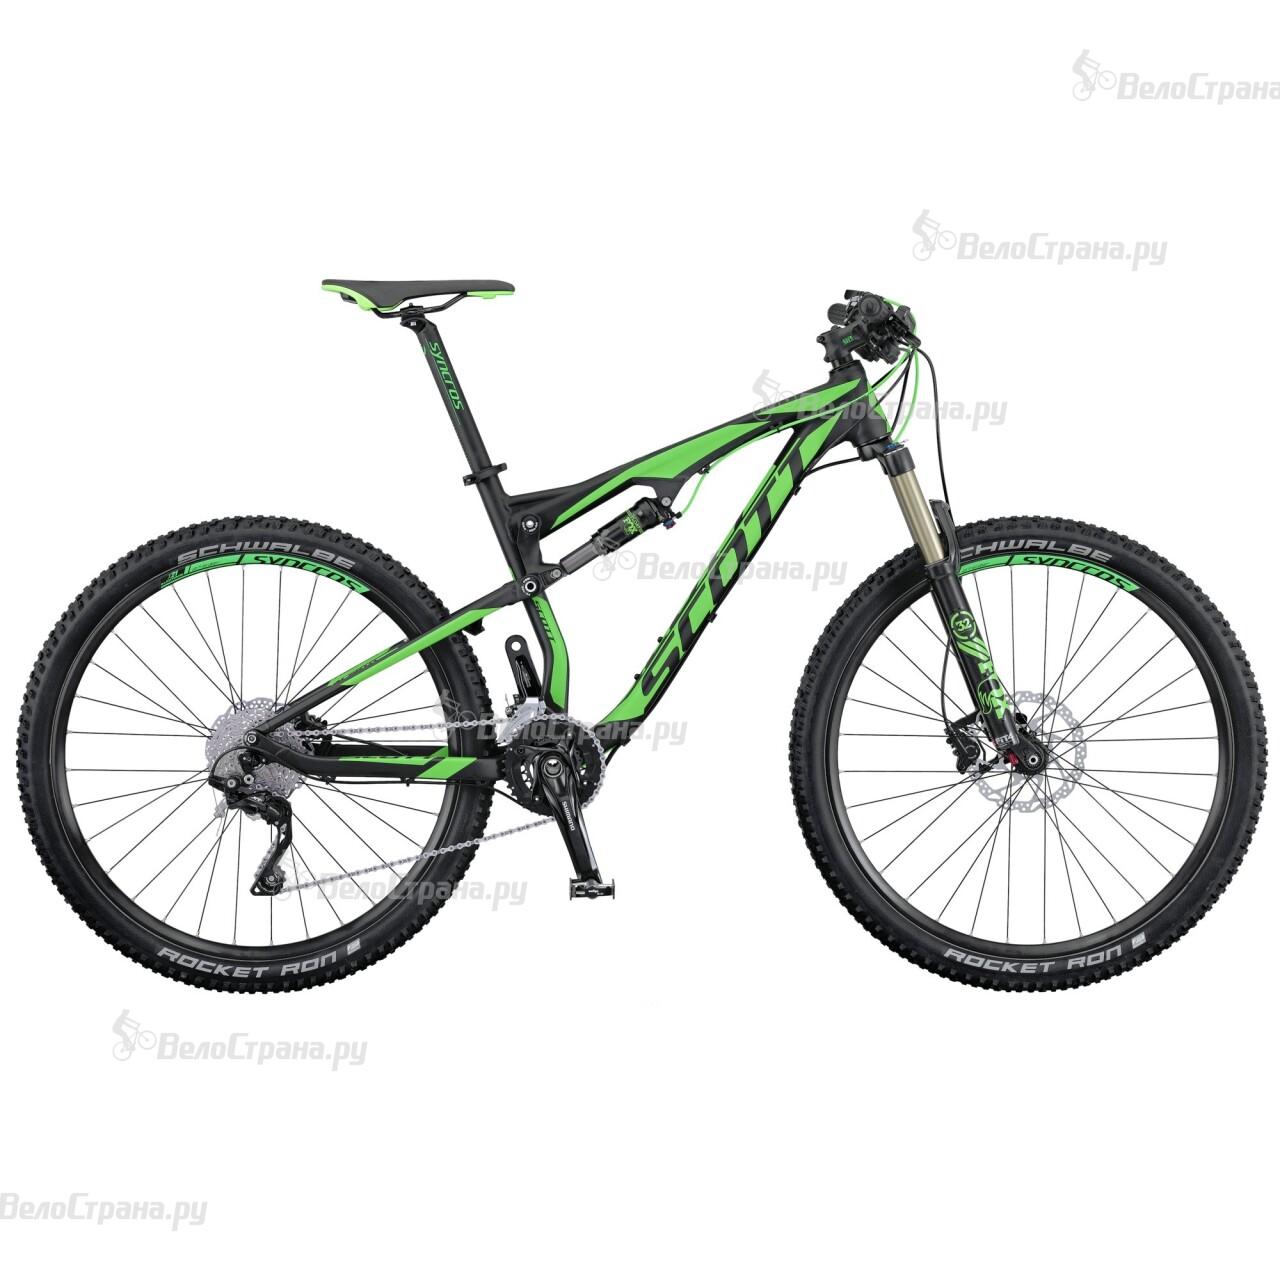 Велосипед Scott Spark 950 (2016) телефон wileyfox spark